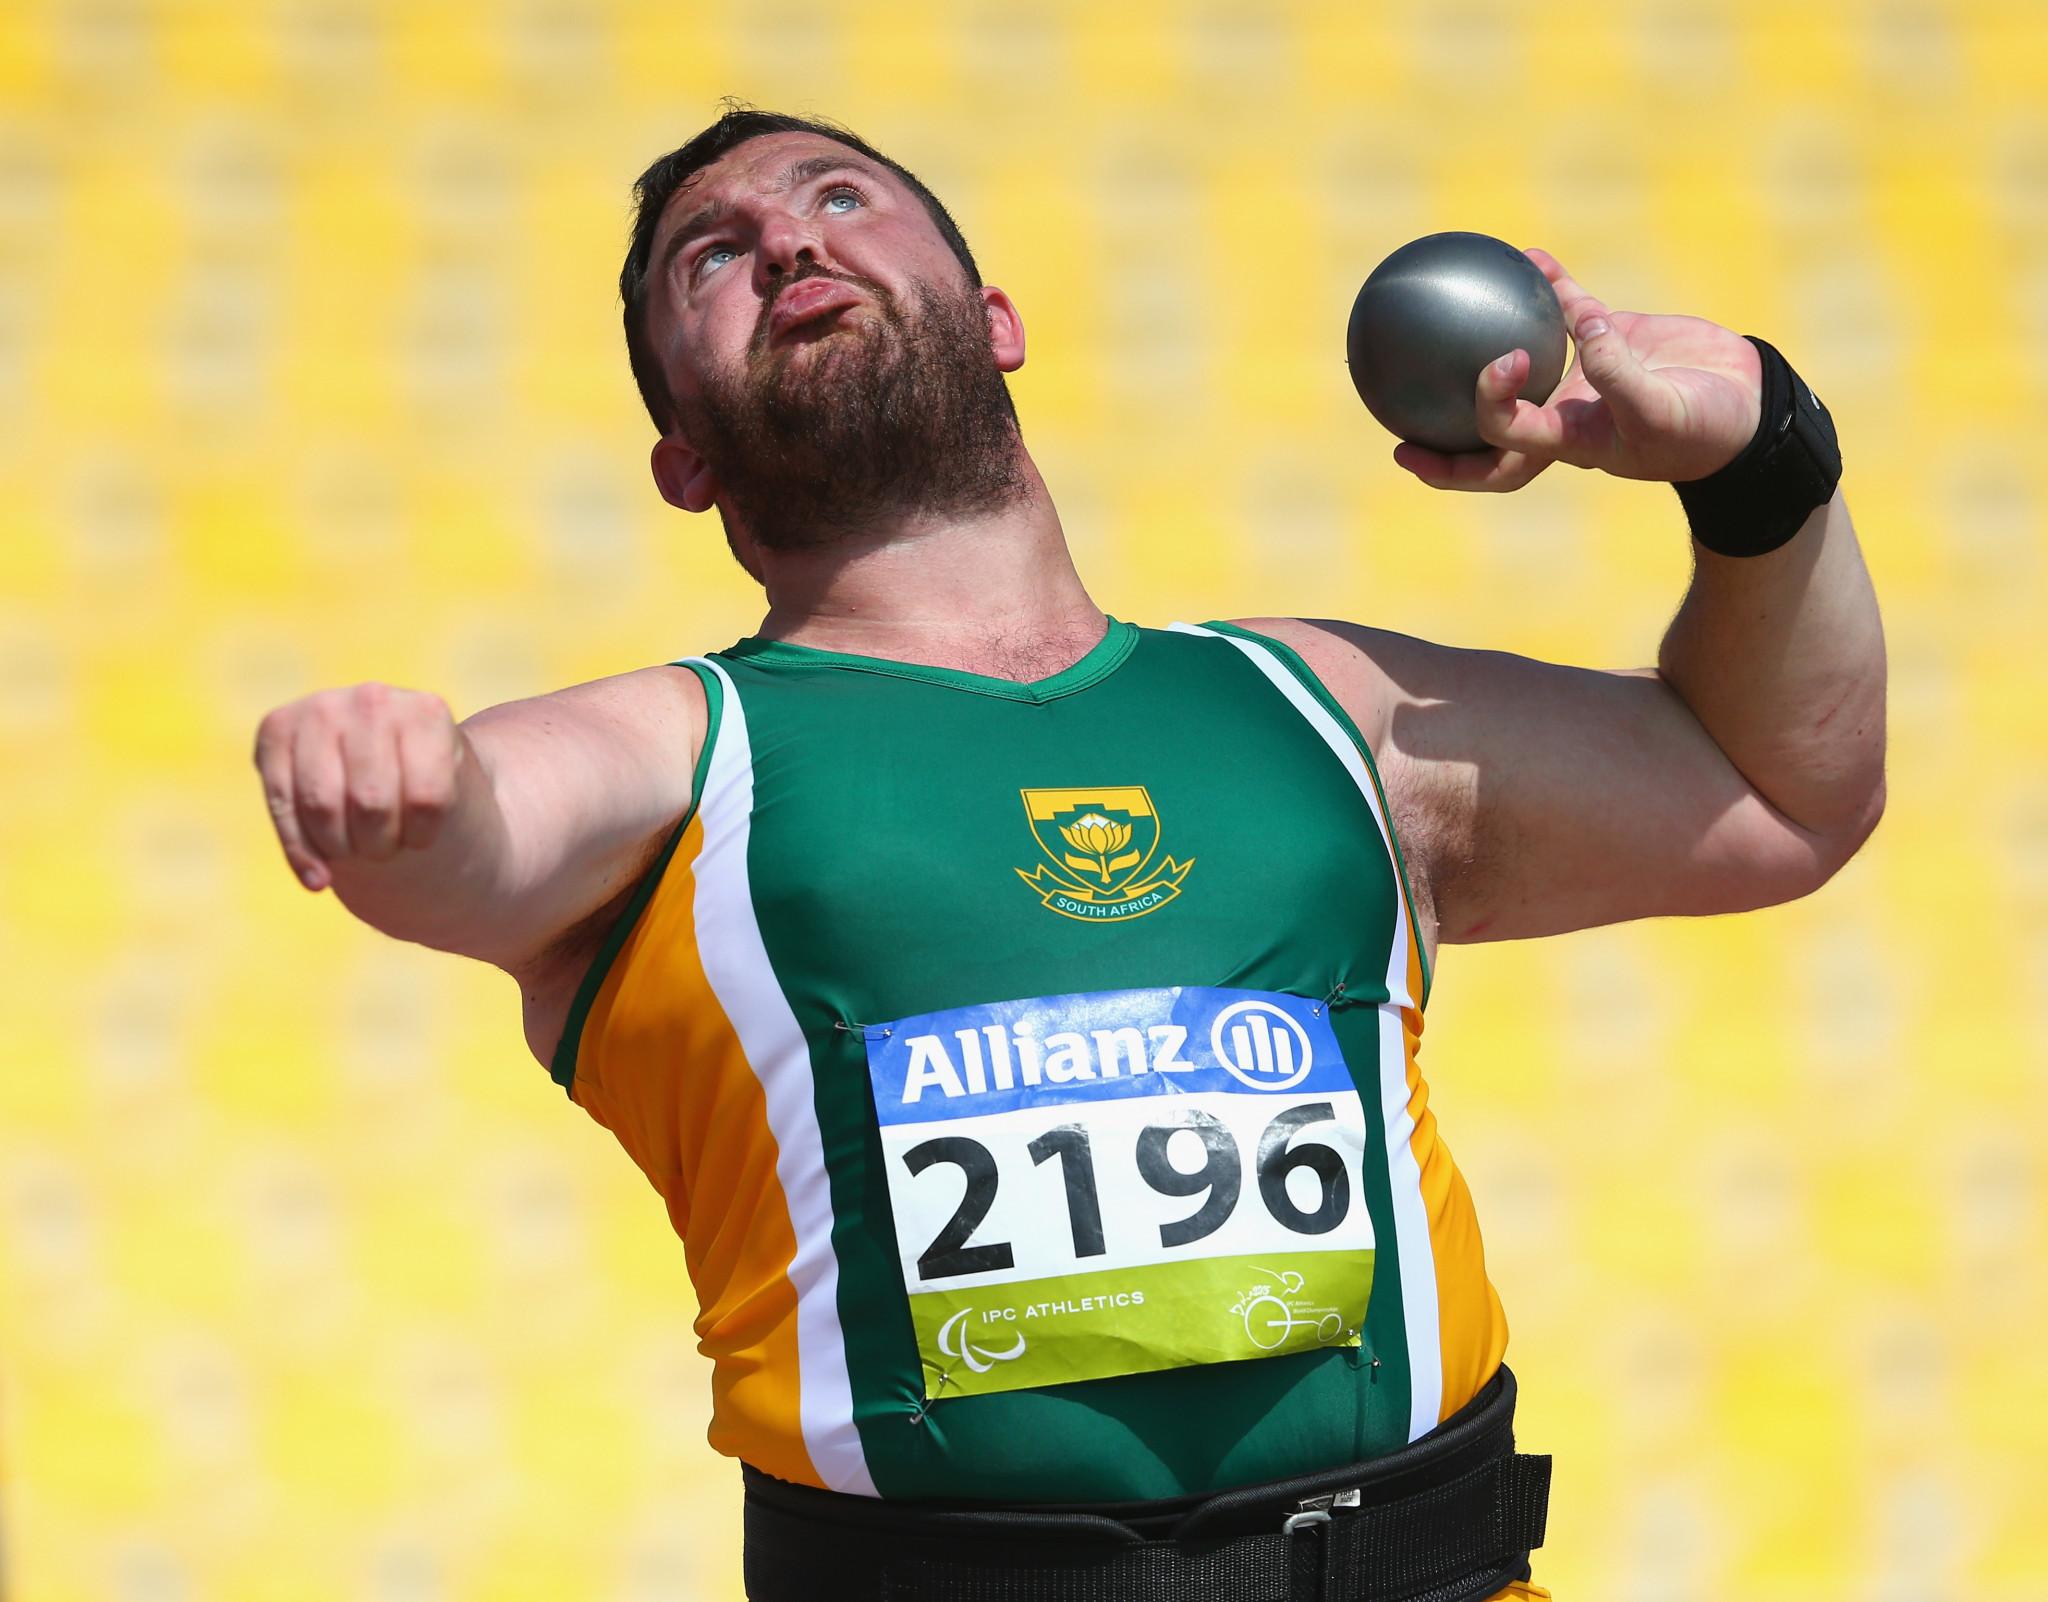 Paralympic champion Hamman emerges triumphant at Para Athletics Grand Prix